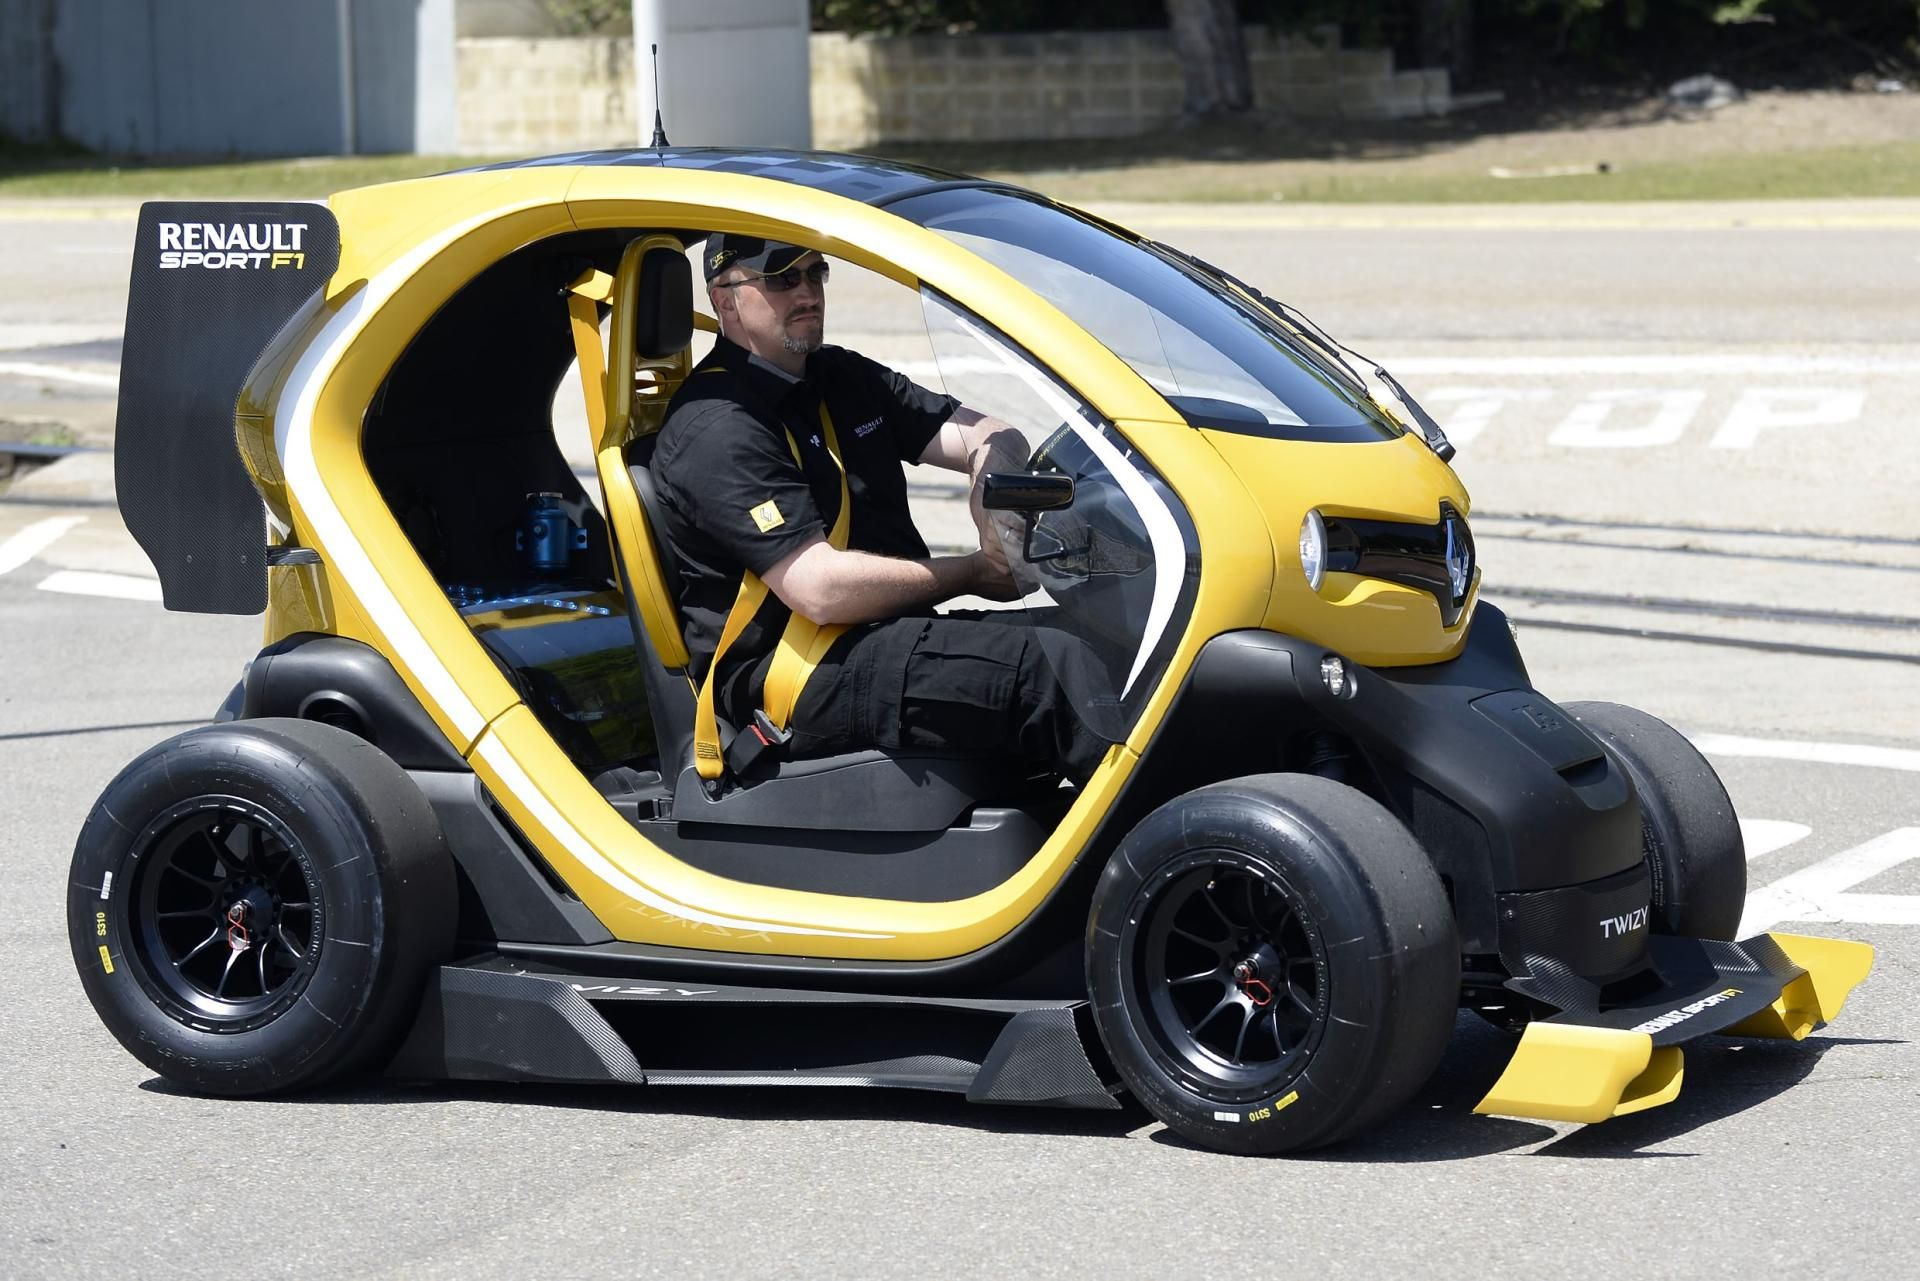 Renault Twizy F1 Renault Sport Voiture Voitures Et Motos